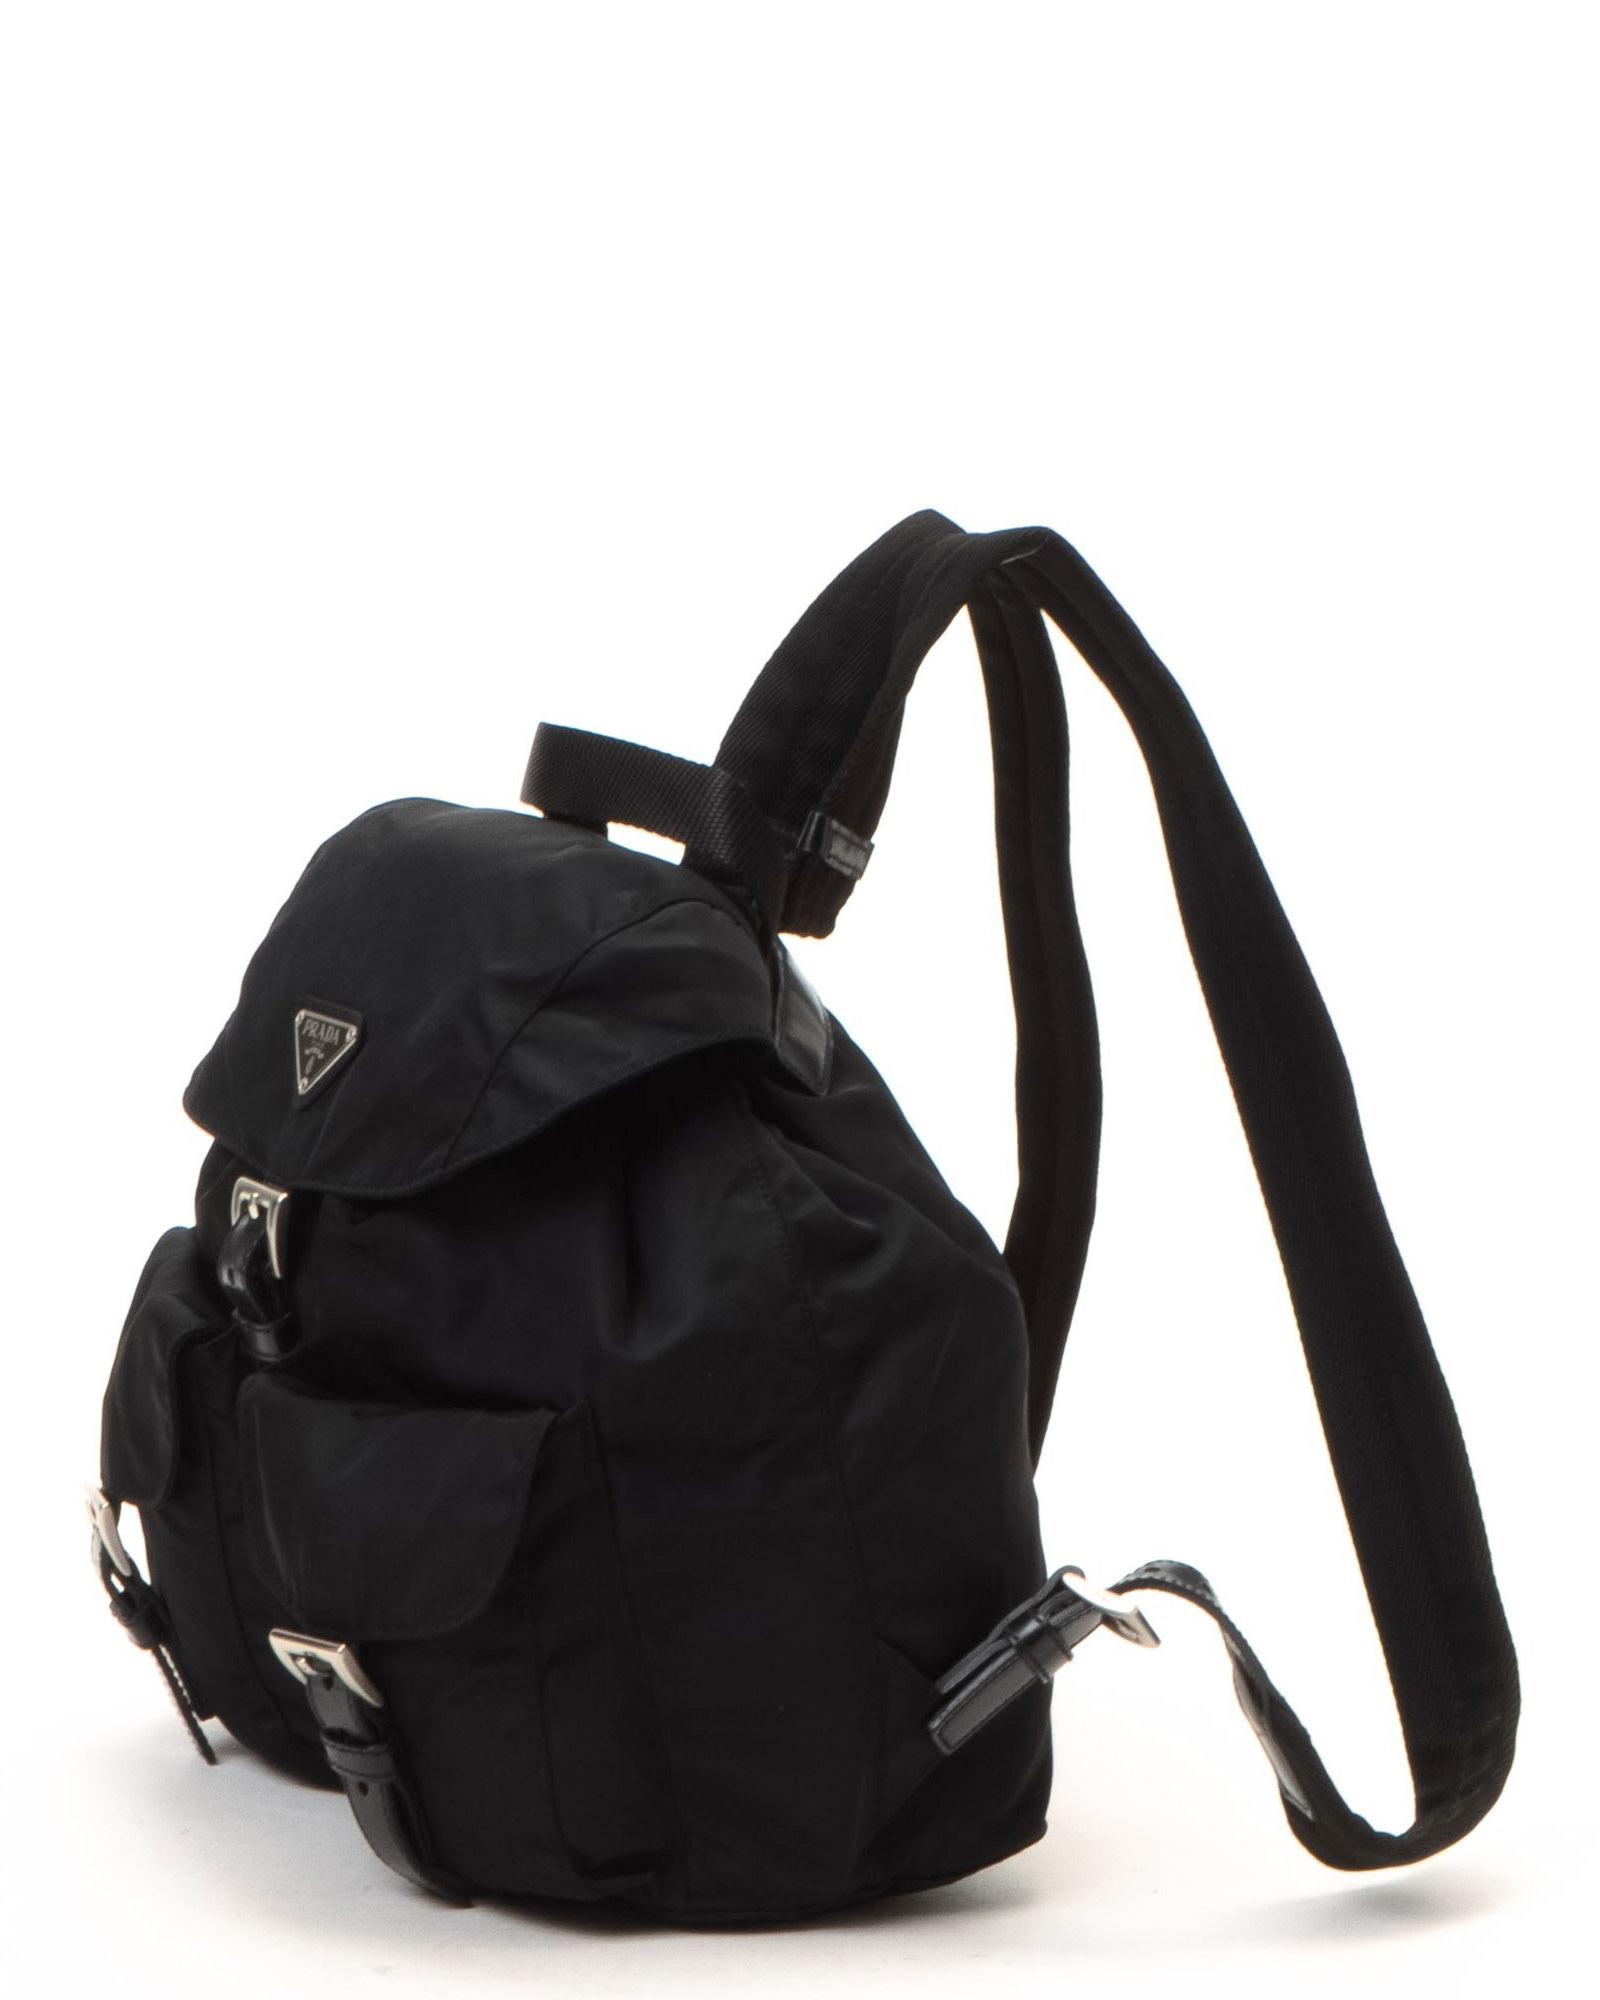 715facceb153 ... czech prada nappy bag prada tessuto backpack vintage in black lyst  613b2 9ab5f